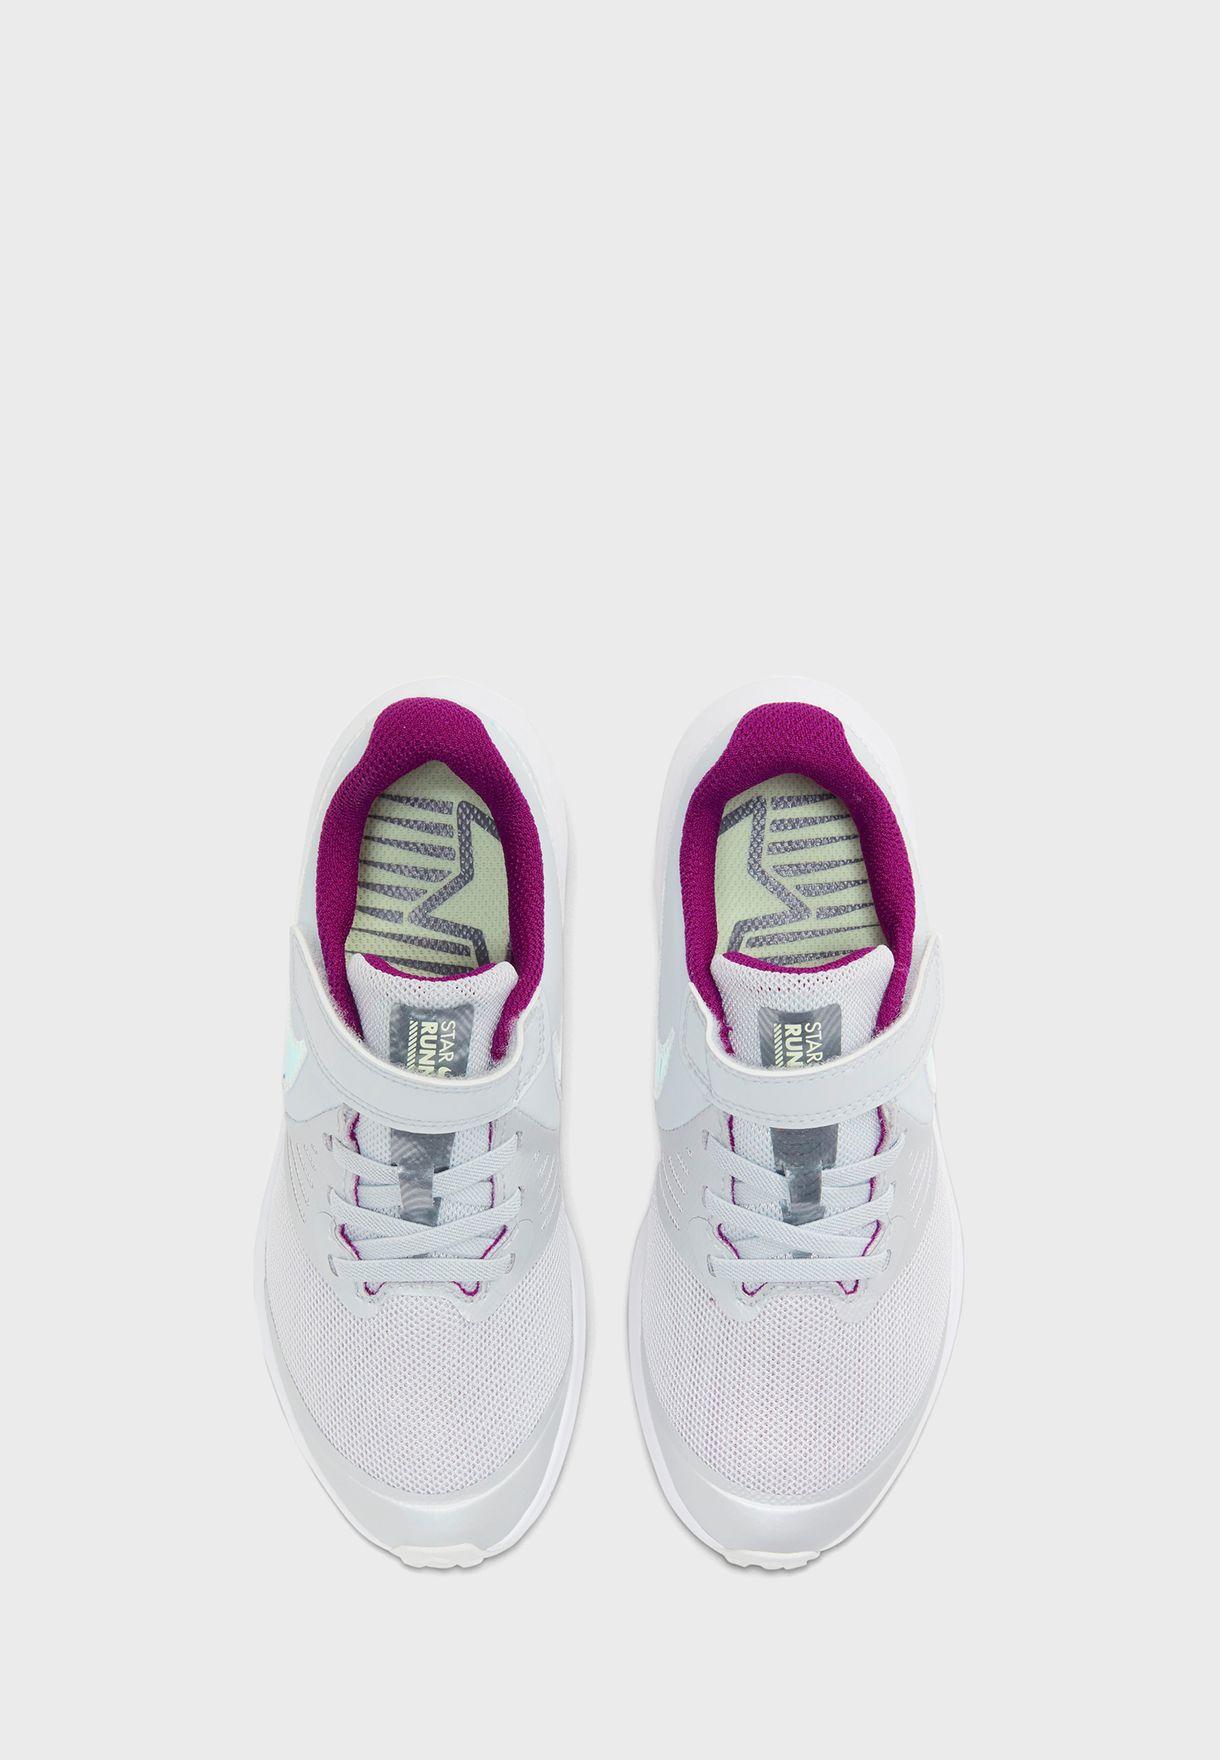 حذاء ستار رنر 2 باور